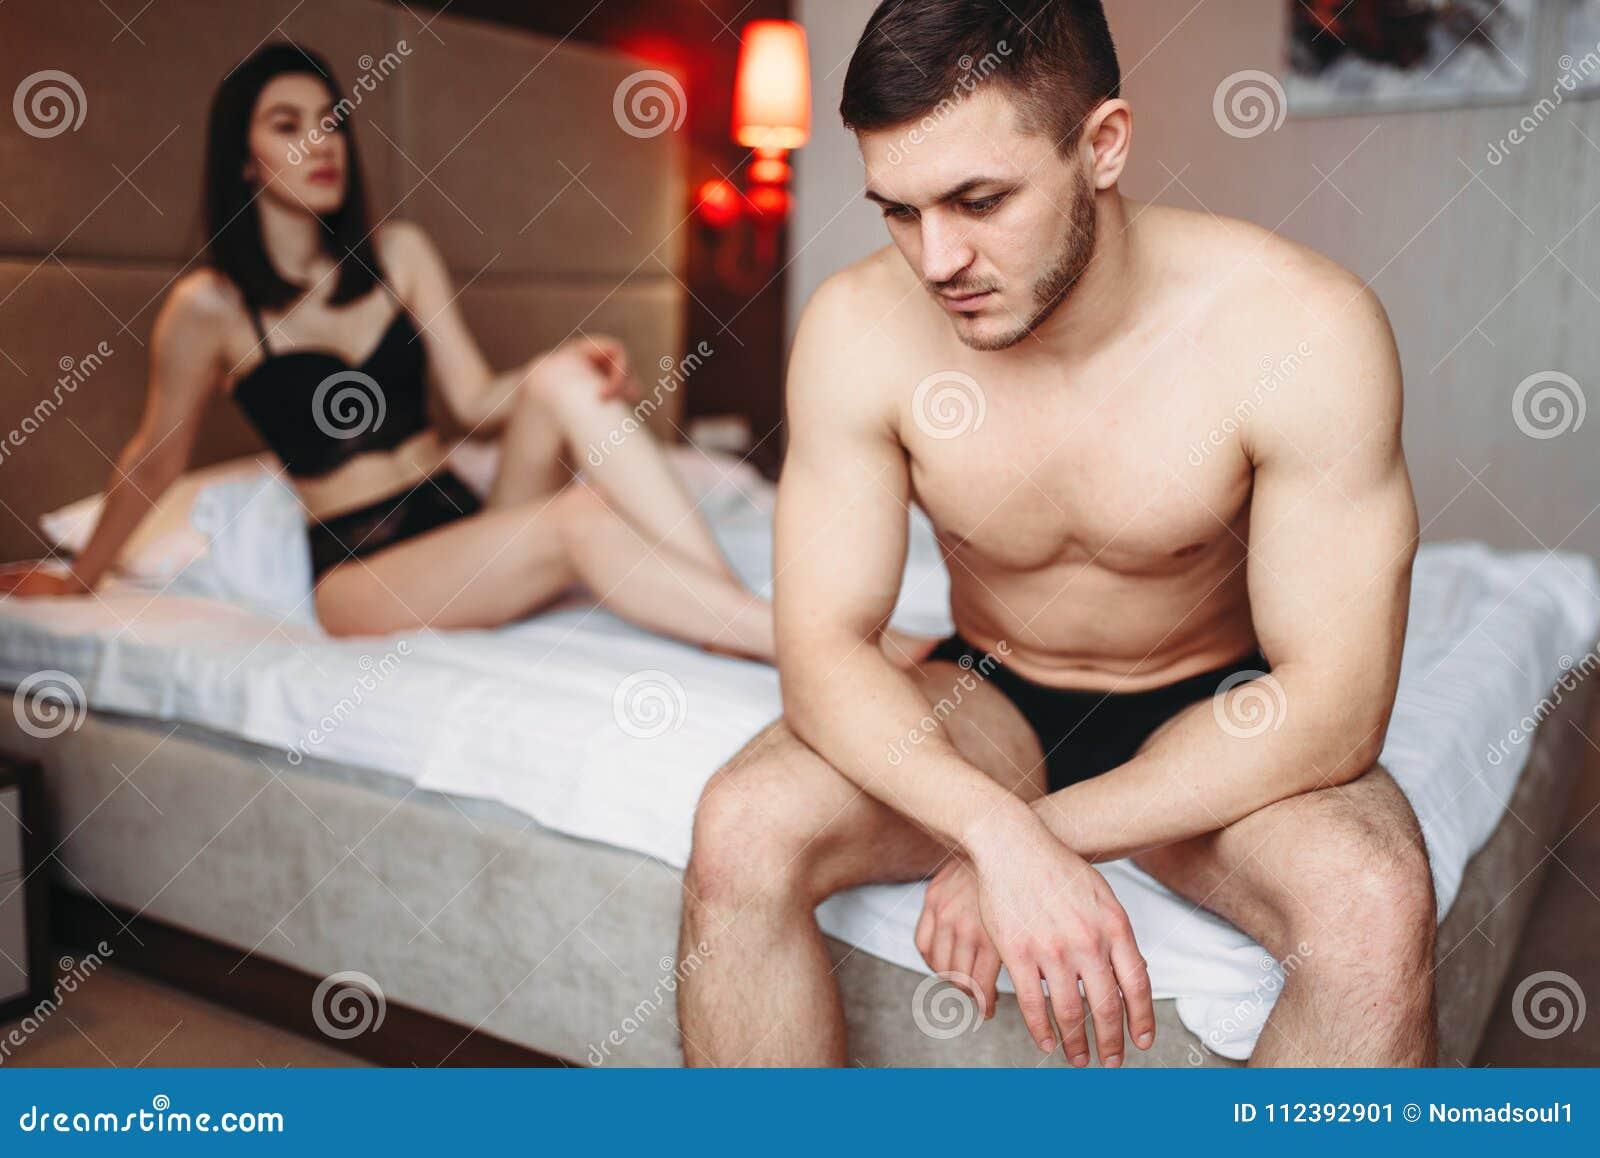 Mia khalifa threesome anal